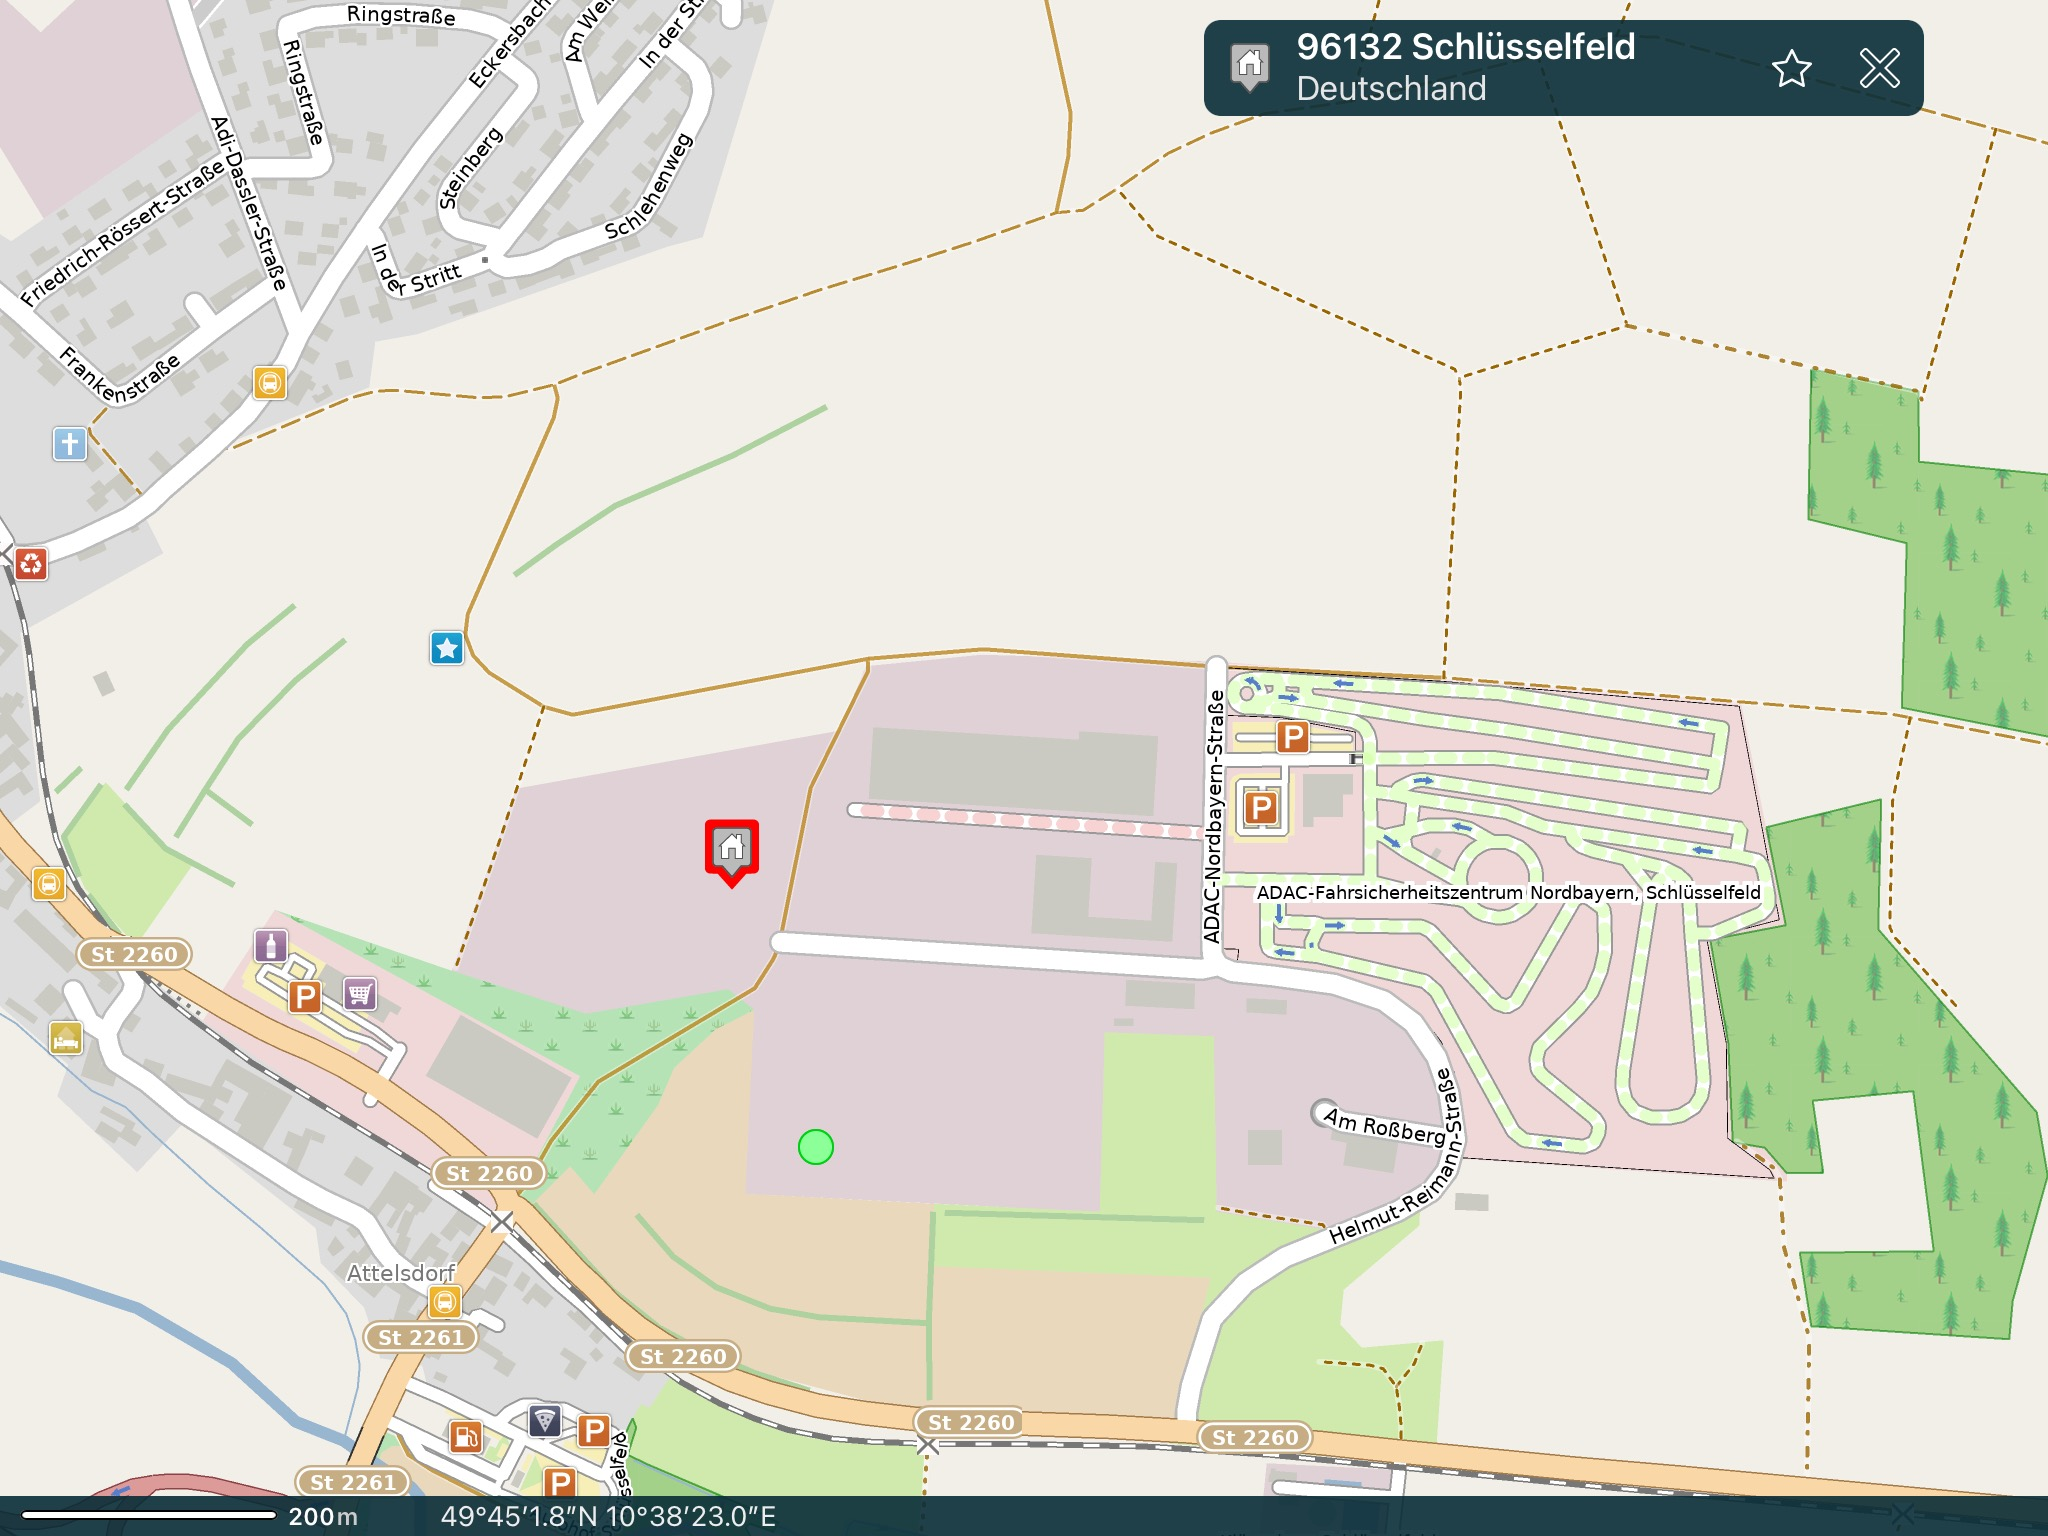 © App PocketEarth - GeoMagik / Adresse: Helmut-Reimann-Straße 2, 96132 Schlüsselfeld